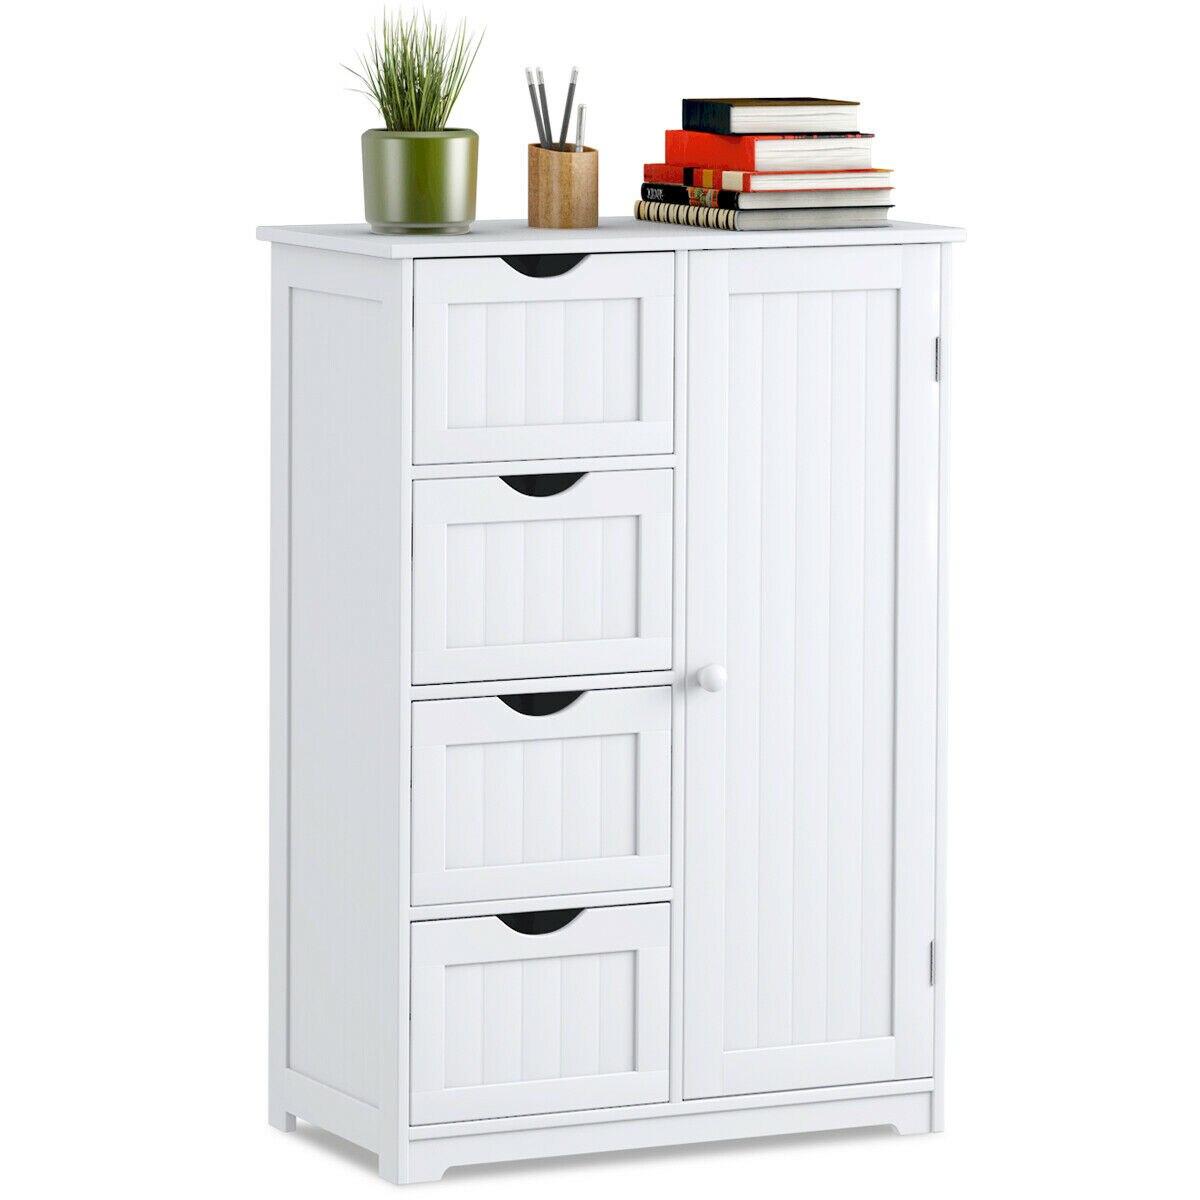 Bathroom Cabinet Storage Cupboard